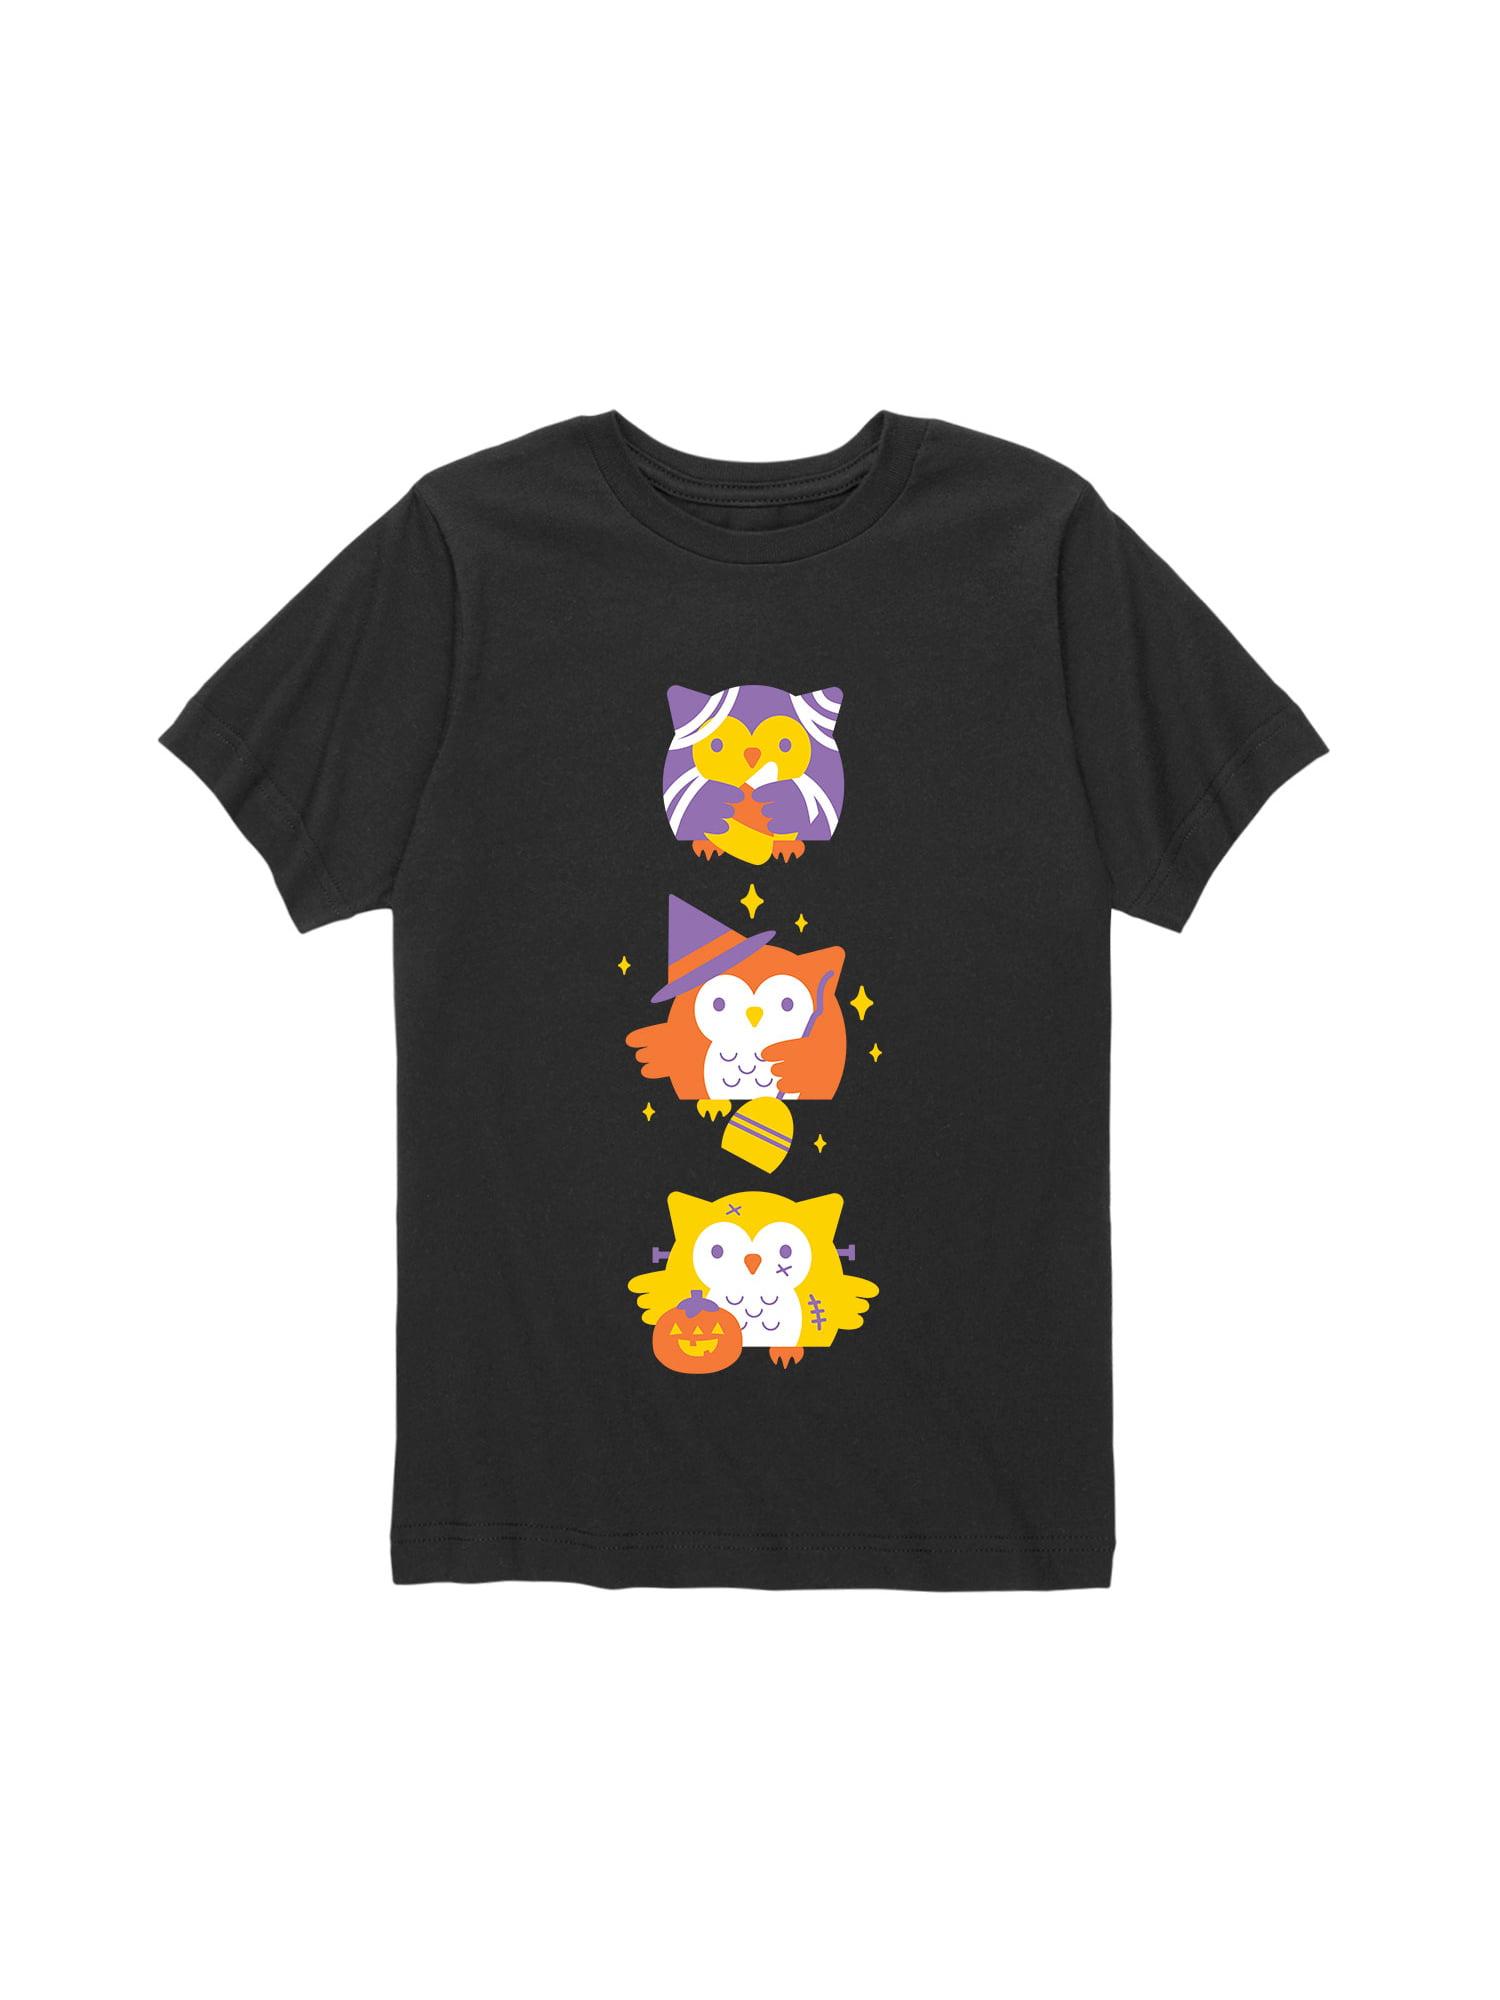 Halloween Owls - Toddler Short Sleeve Tee